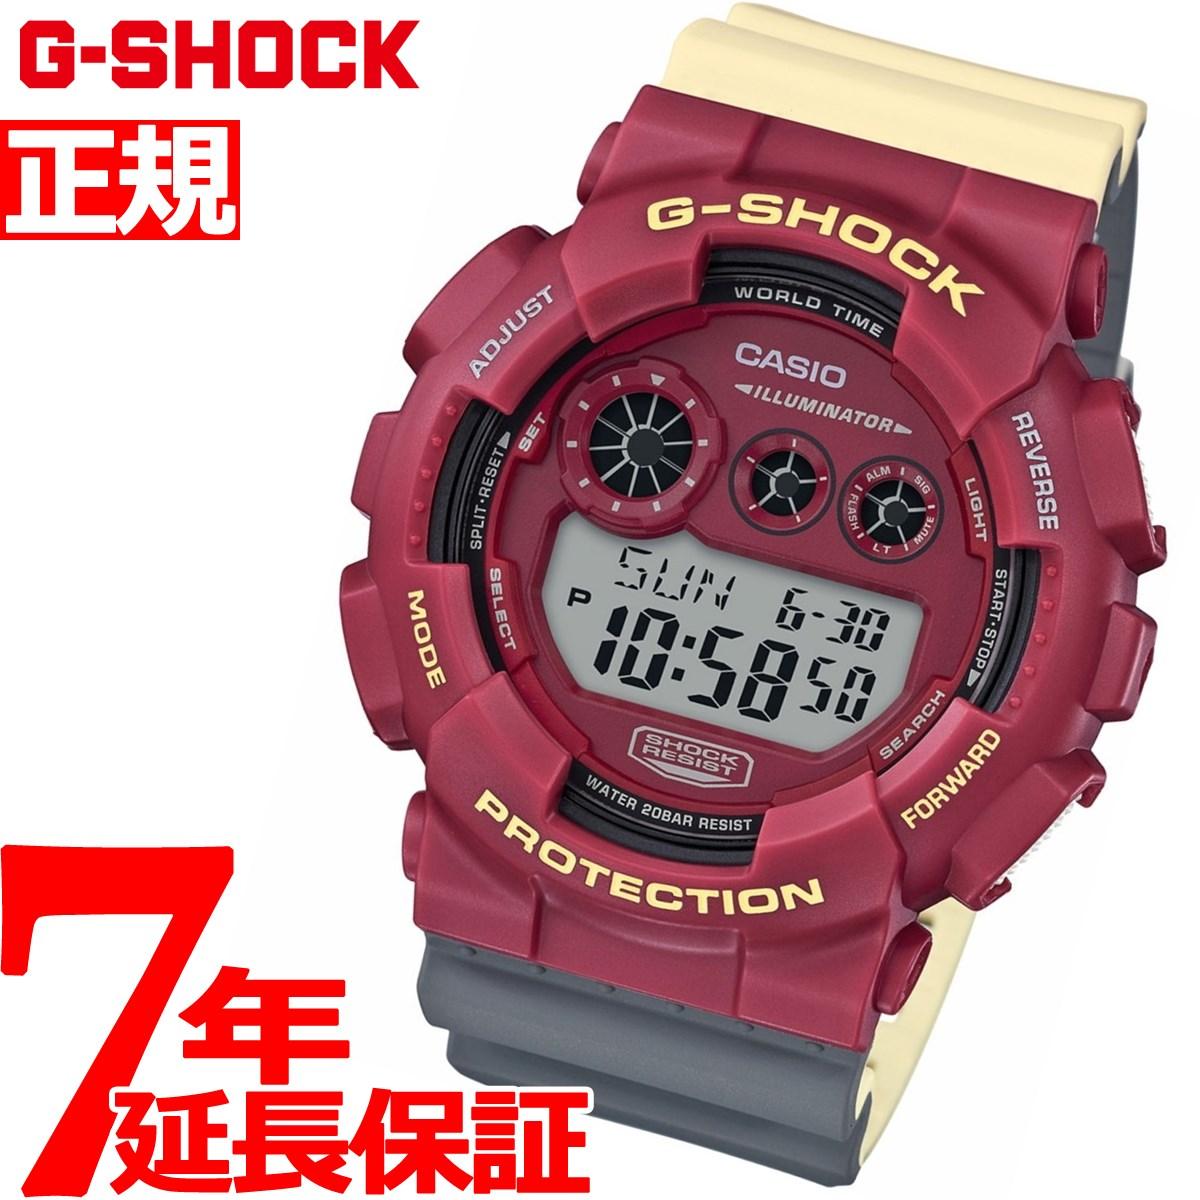 G-SHOCK 限定モデル 腕時計 メンズ GD-120NC-4JF【2018 新作】